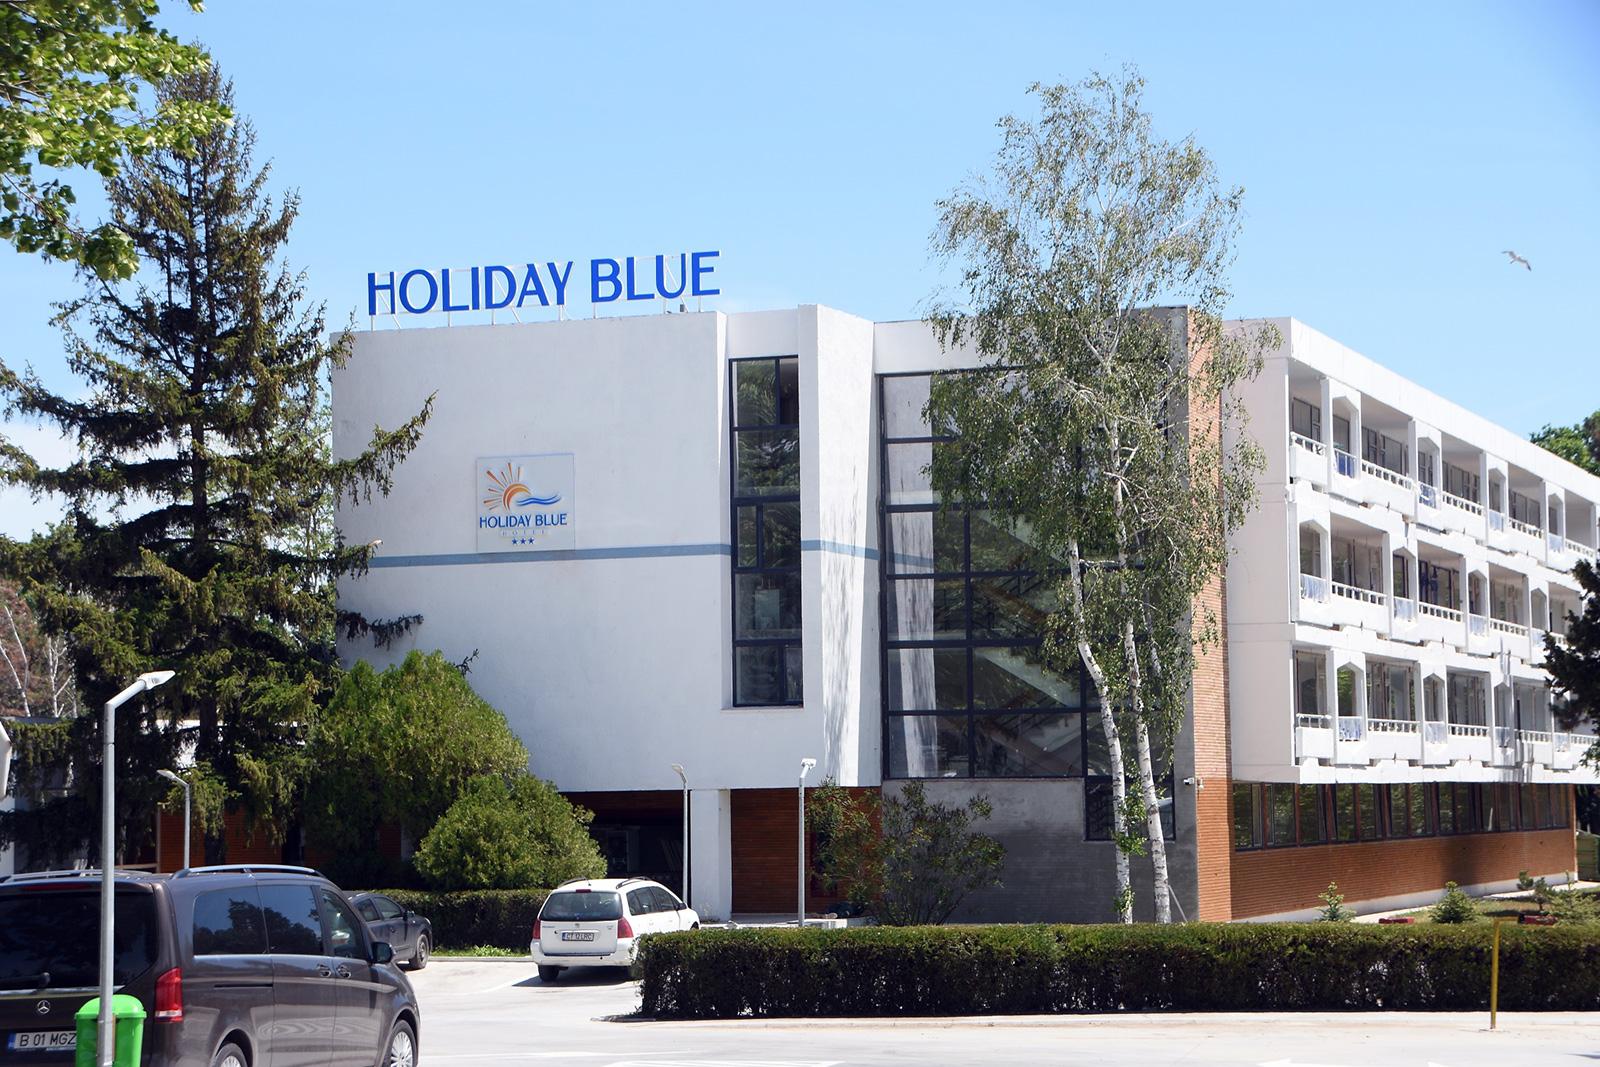 Hotel Holiday Blue